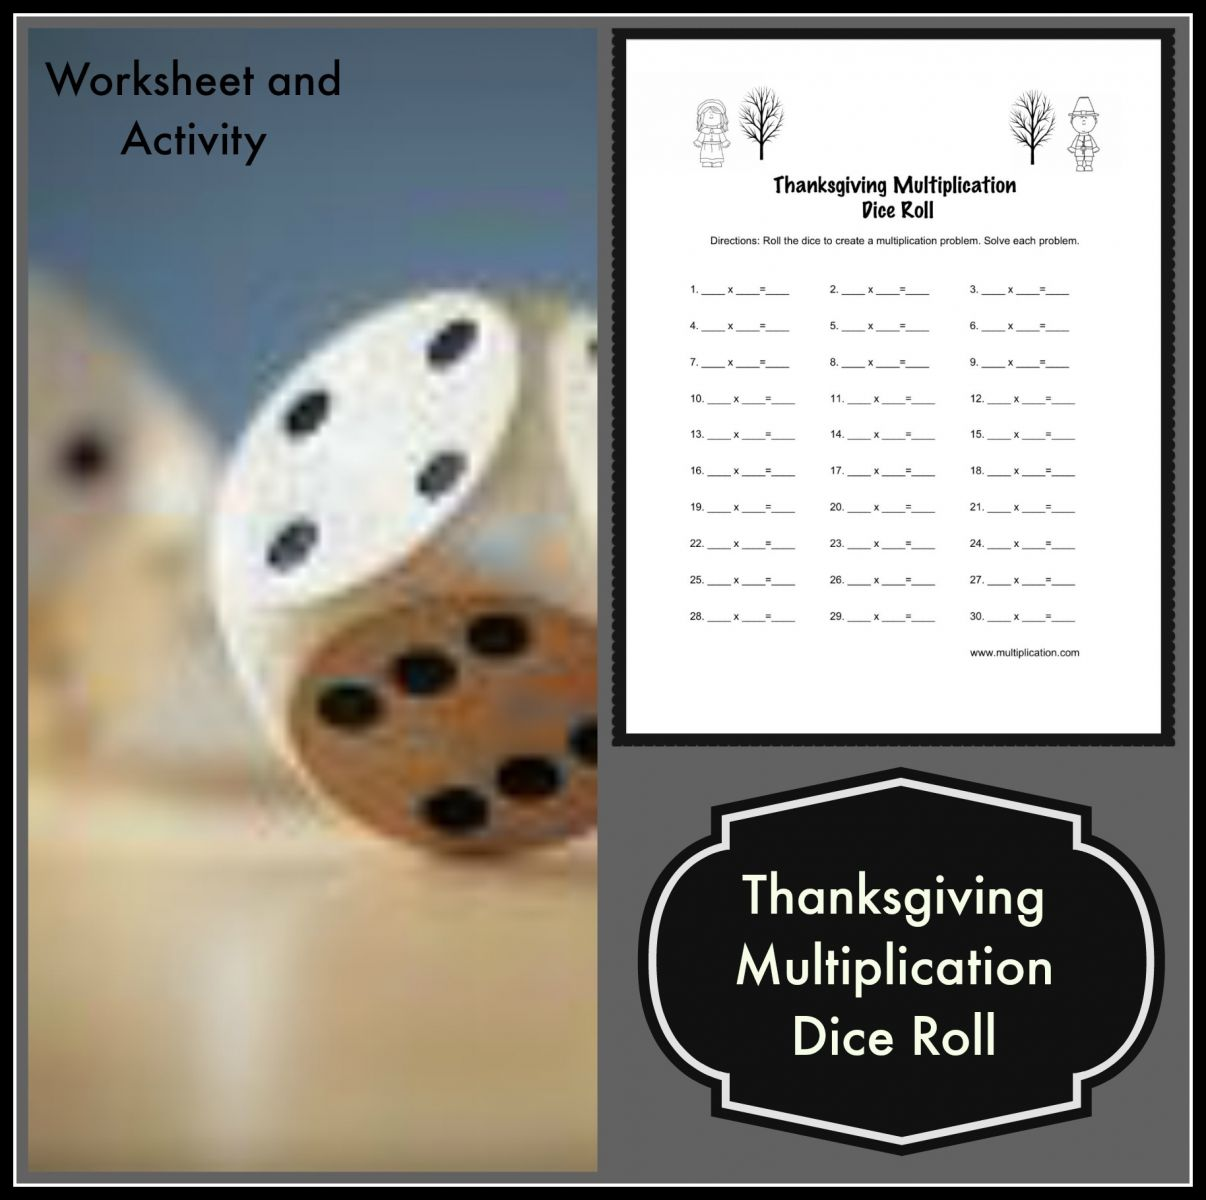 Thanksgiving Multiplication Dice Roll Worksheet